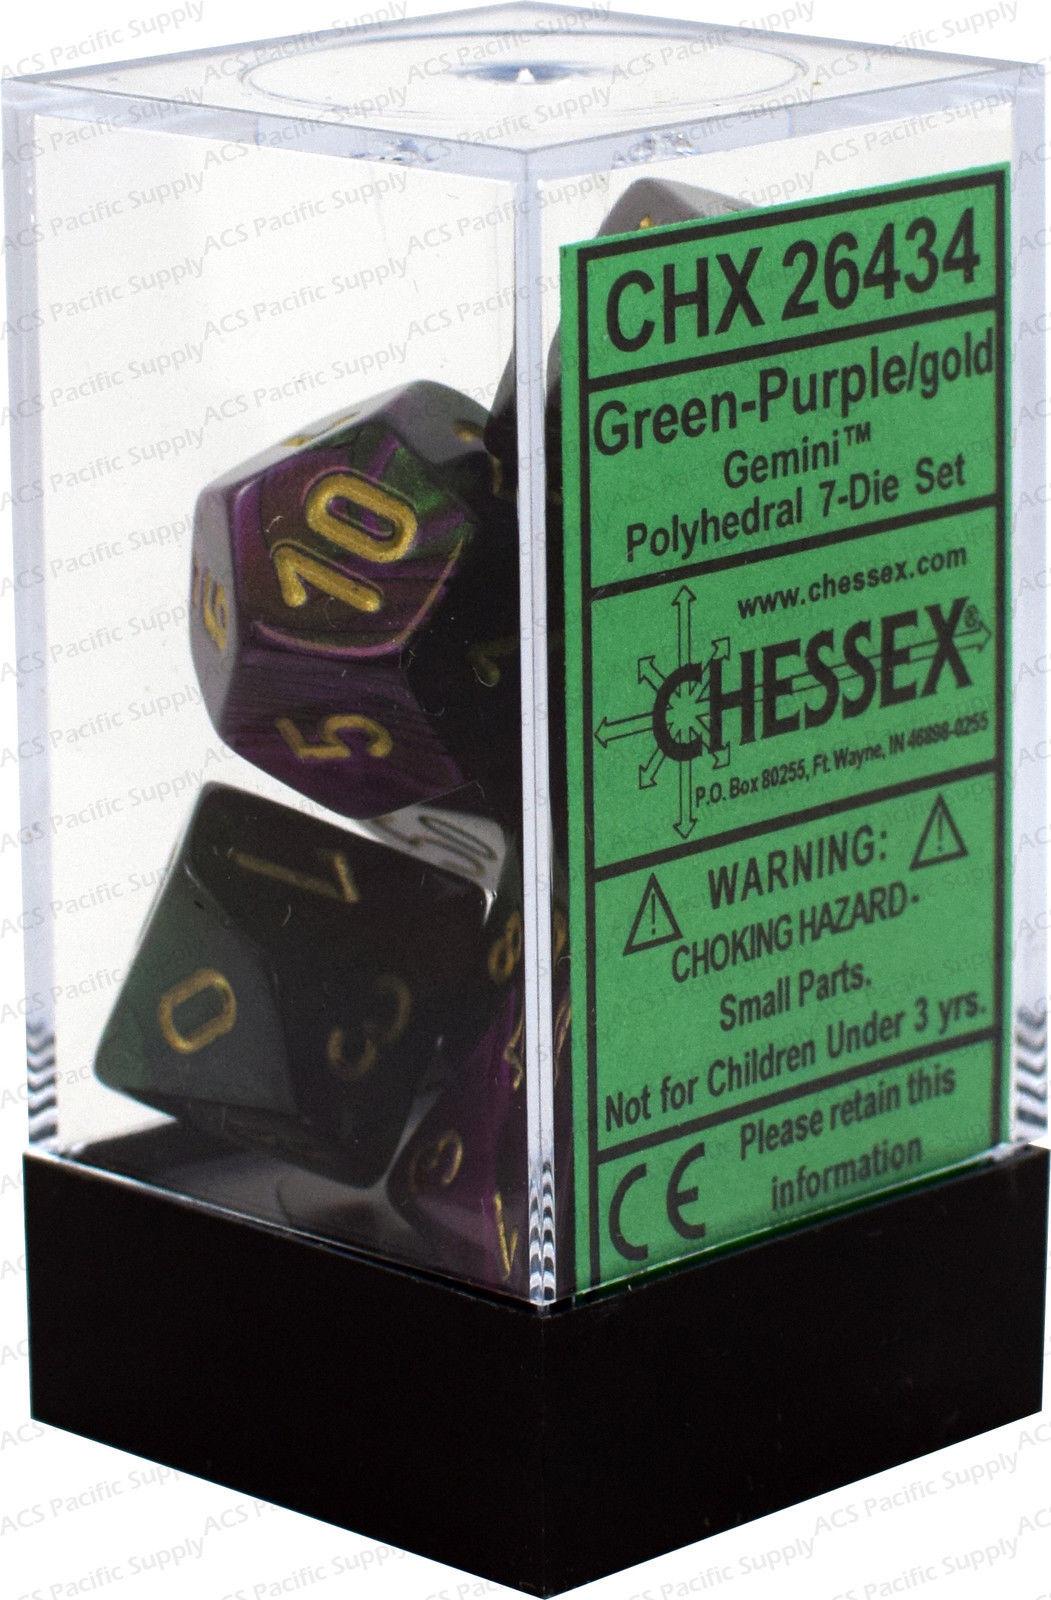 Gemini Green-Purple w/Gold CHX26434